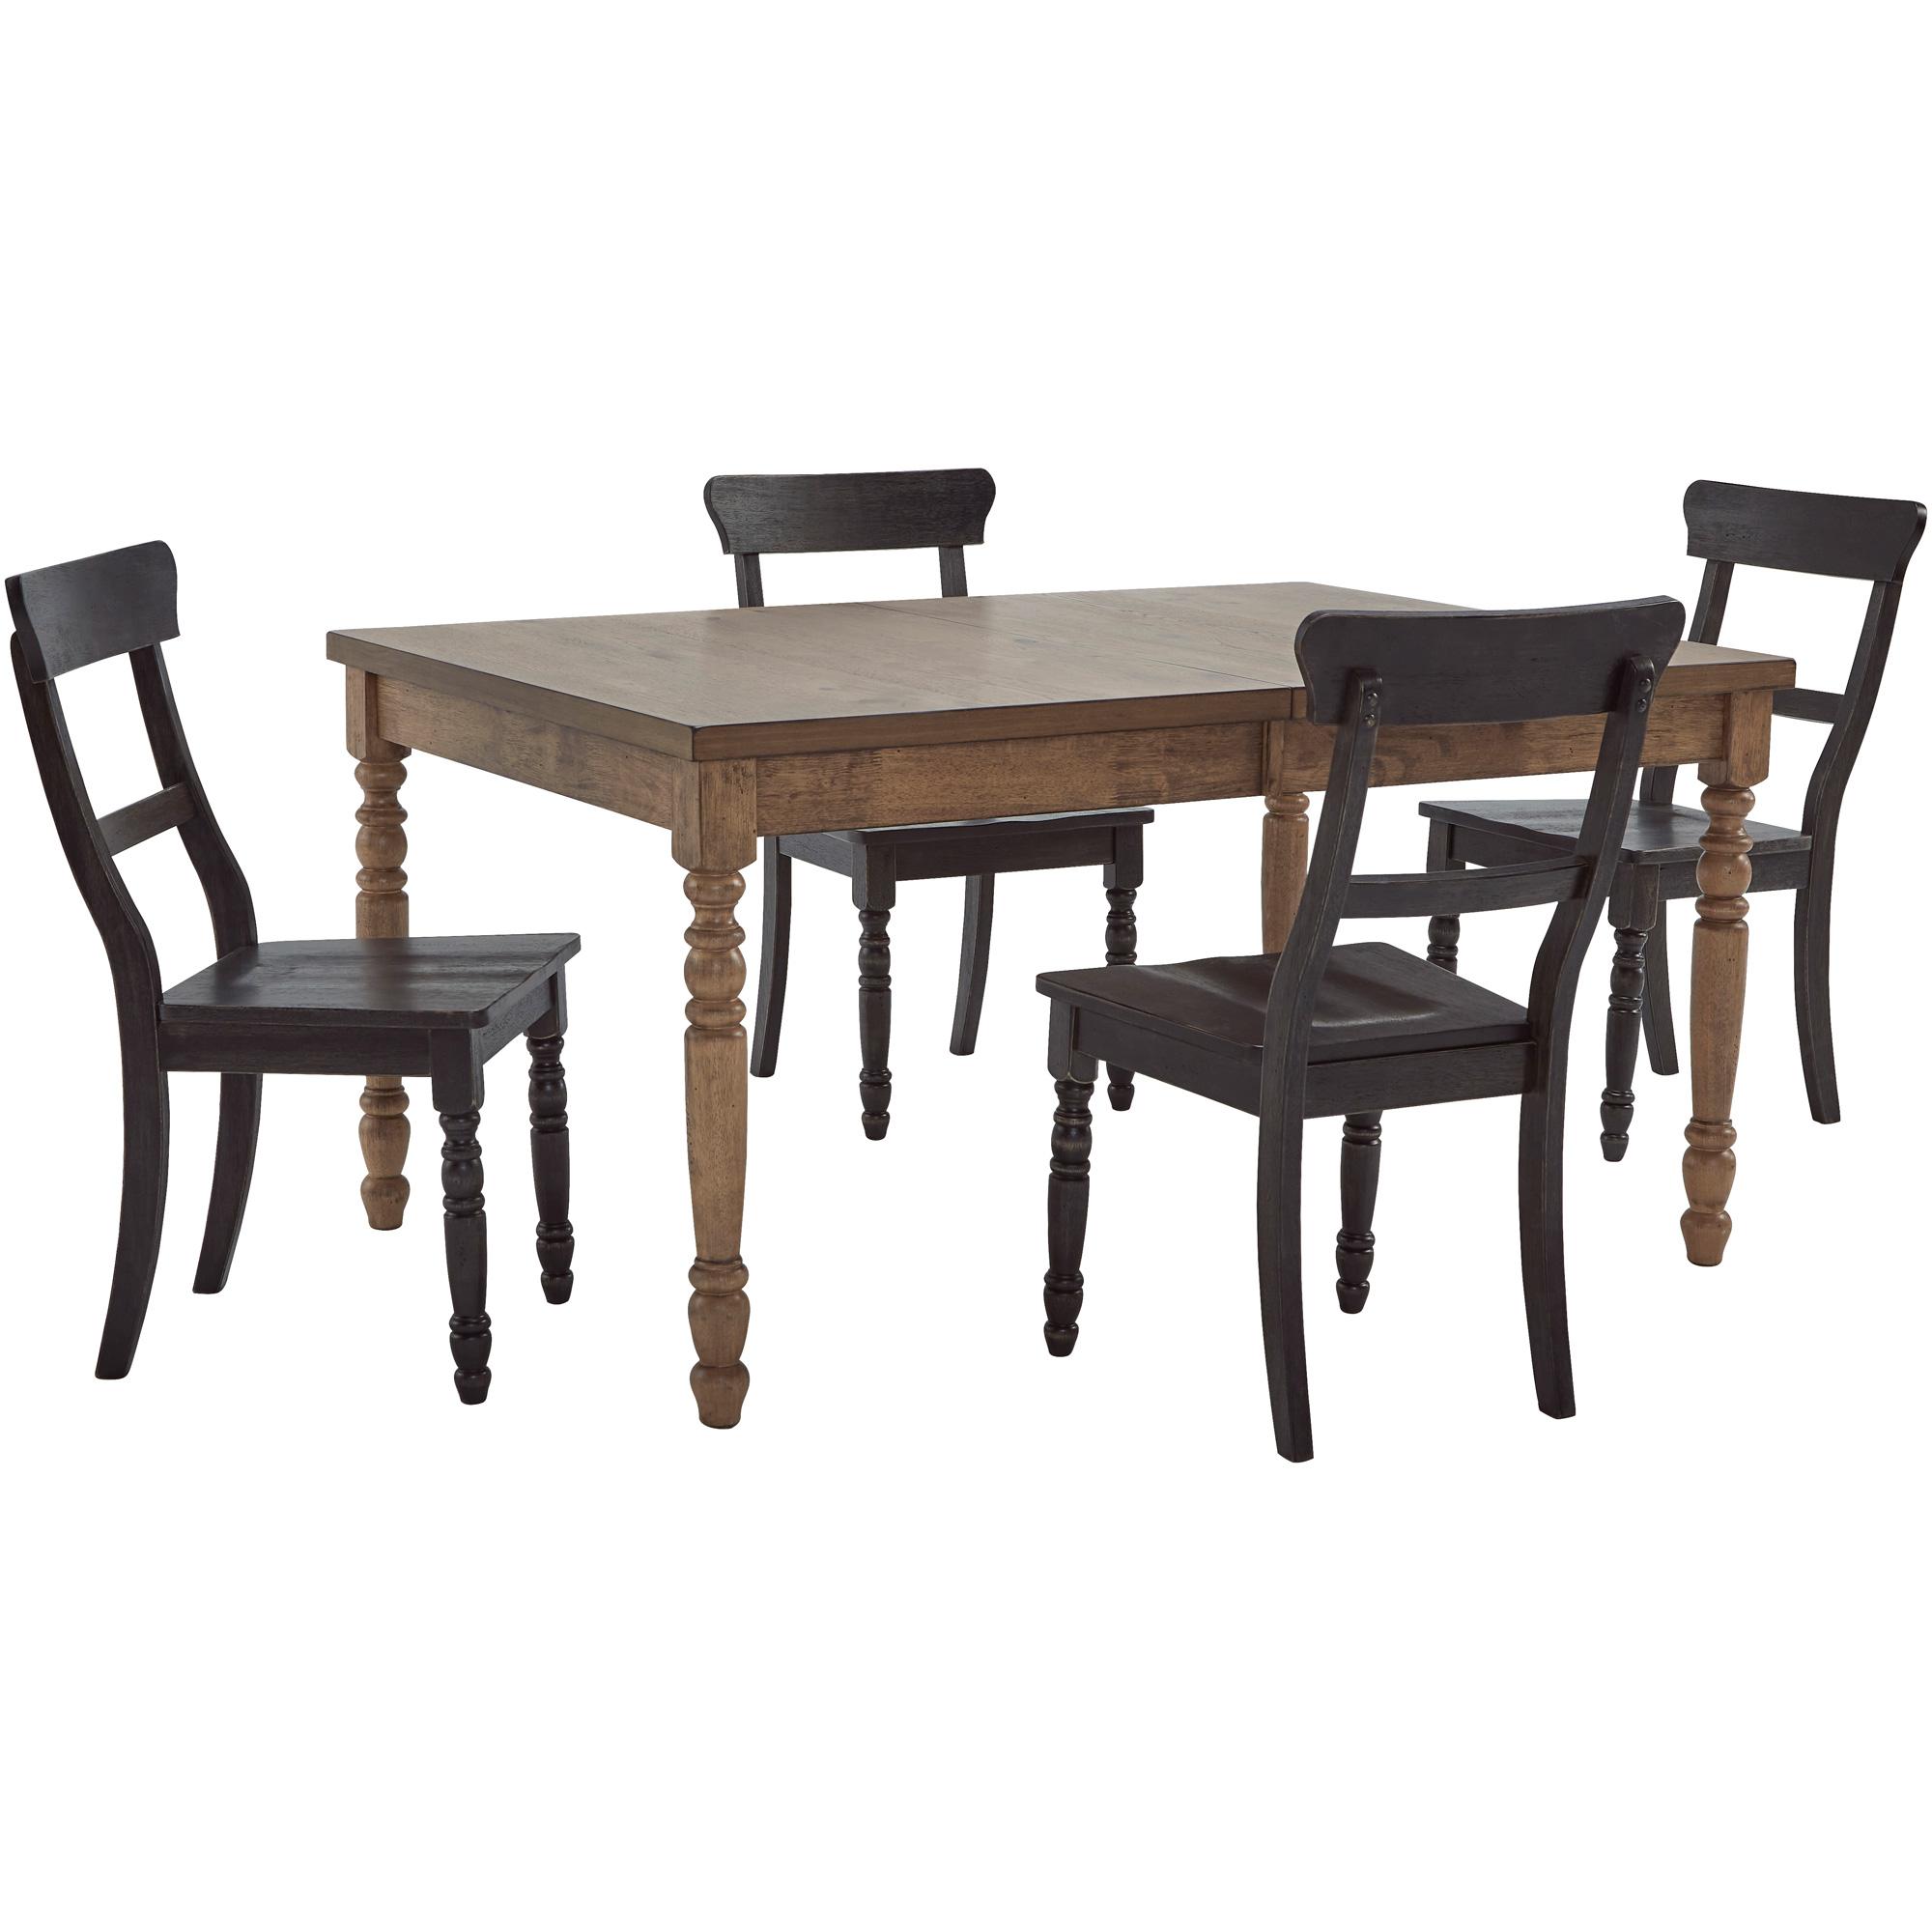 Progressive Furniture Inc. | Savannah Court Antique Oak and Black 5 Piece Dining Set